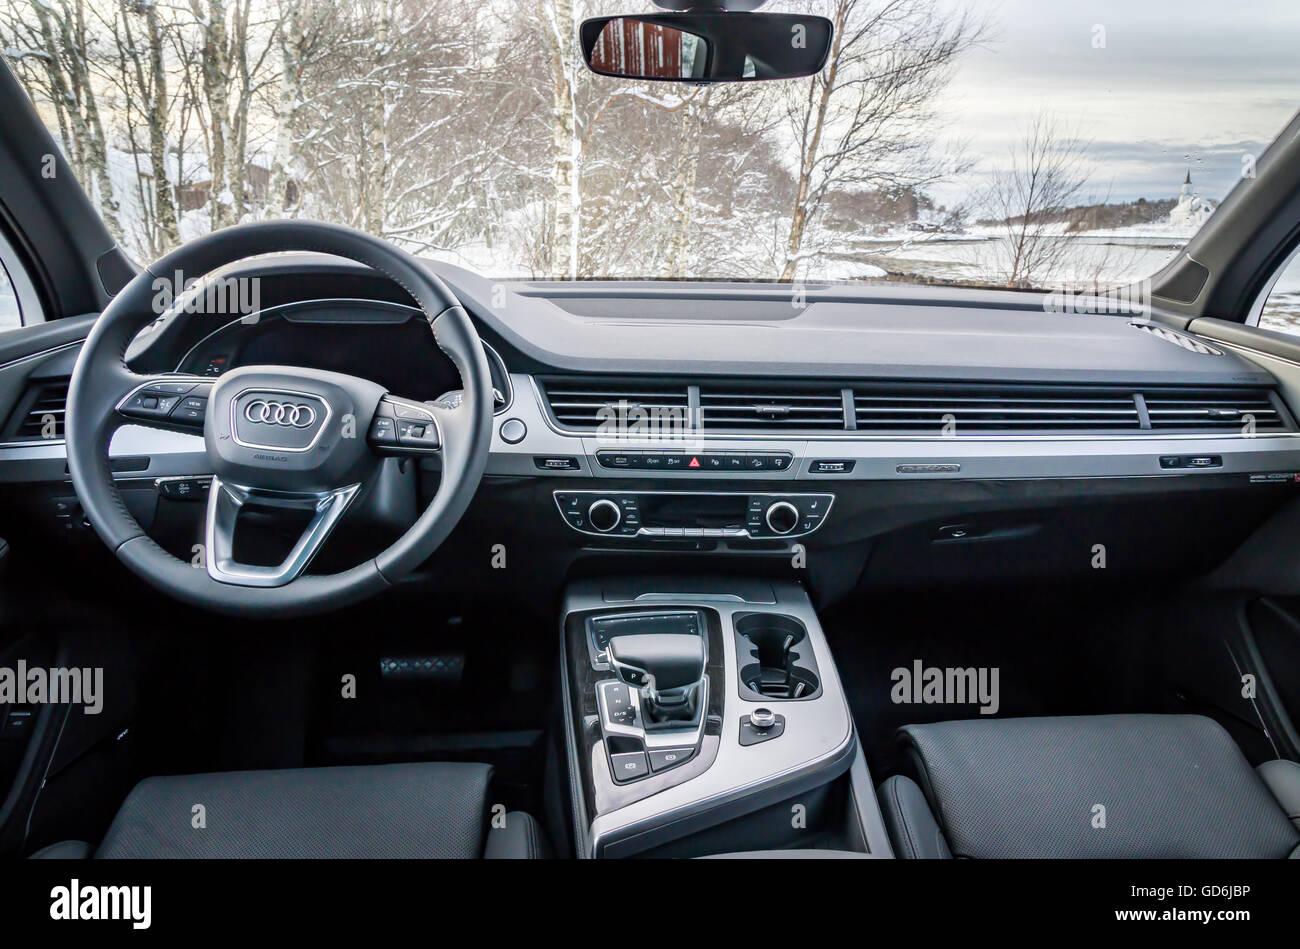 Audi Q7-Interieur Stockfoto, Bild: 111398890 - Alamy